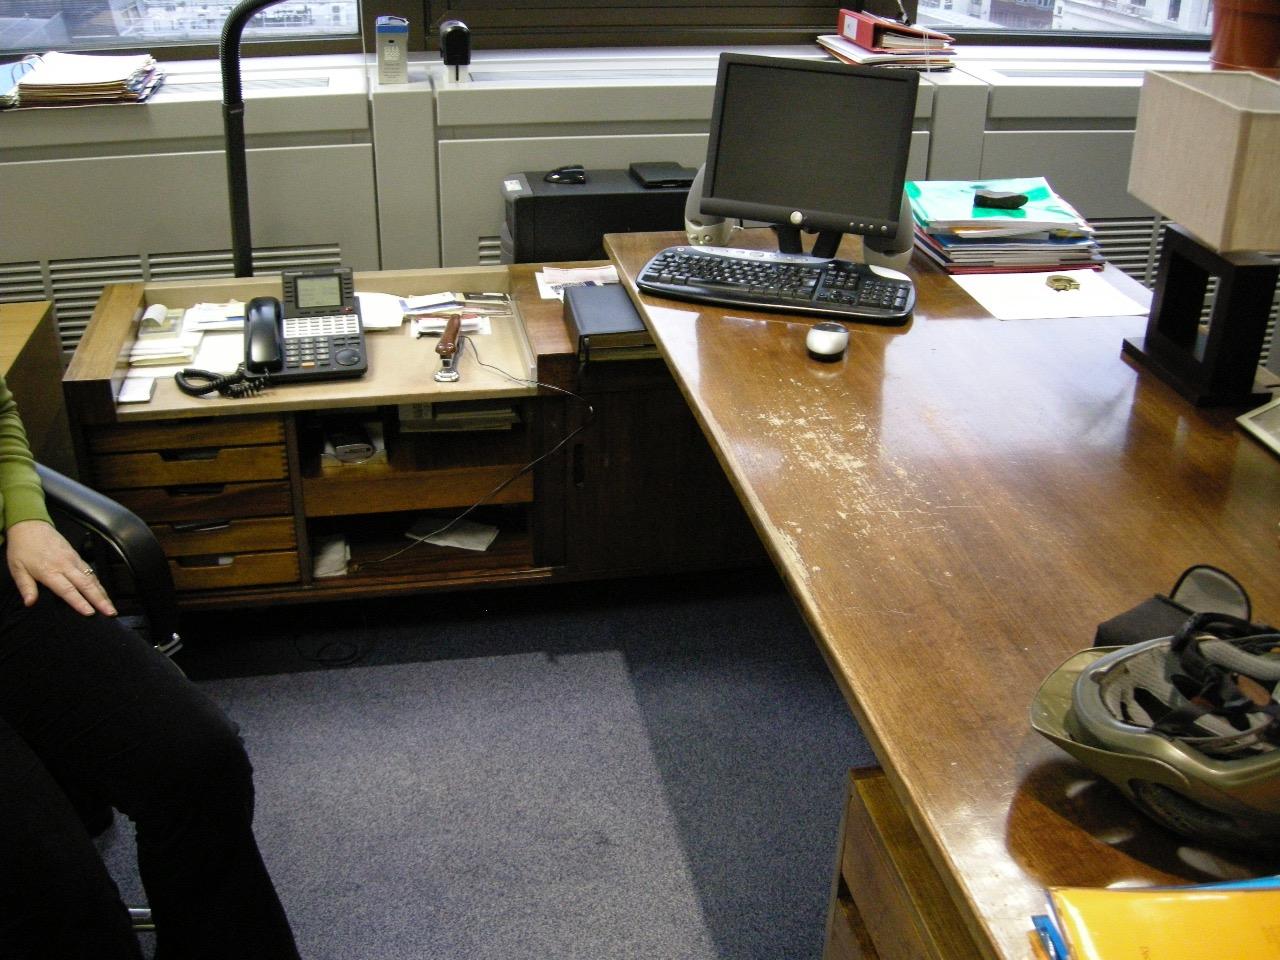 The desk before restoration.